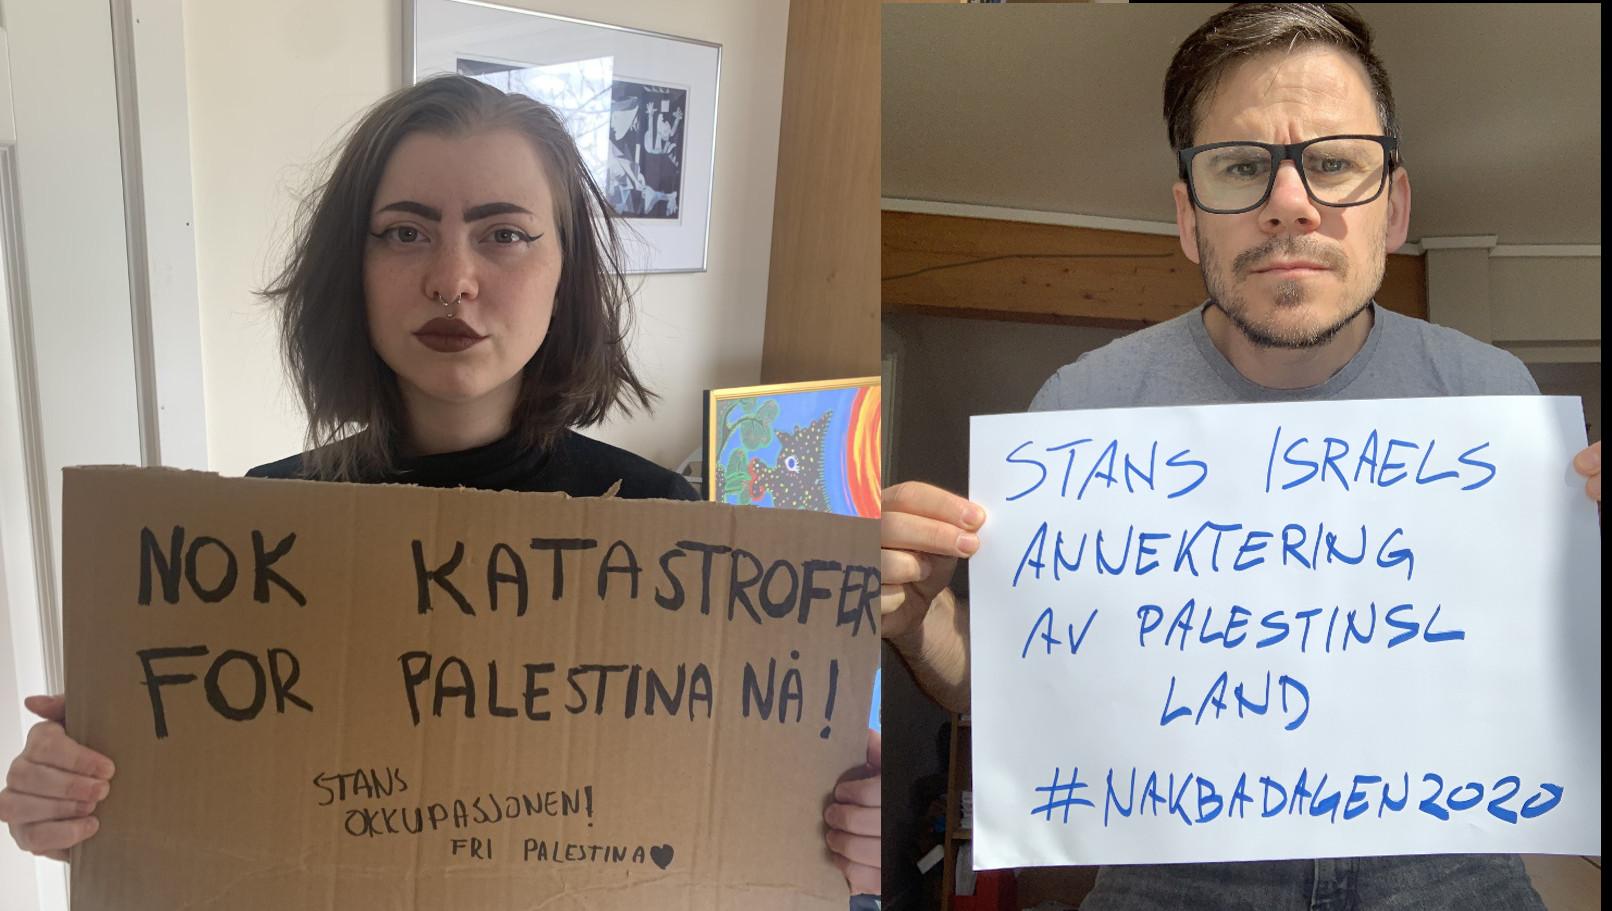 Nok katastrofer for Palestina